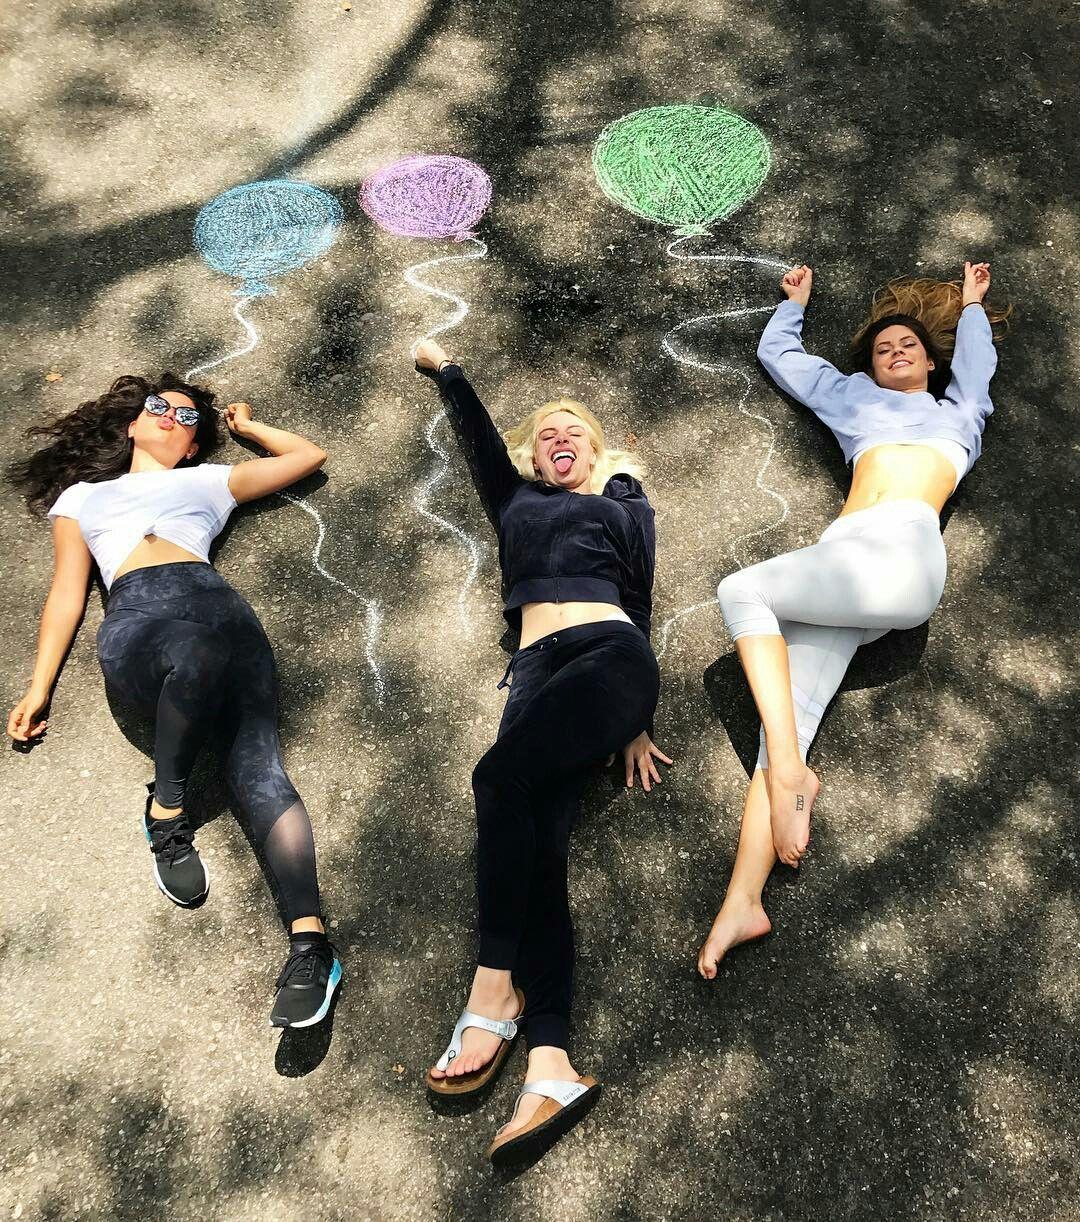 Lele Pons Hannah Stocking Inanna Friend Photoshoot Friends